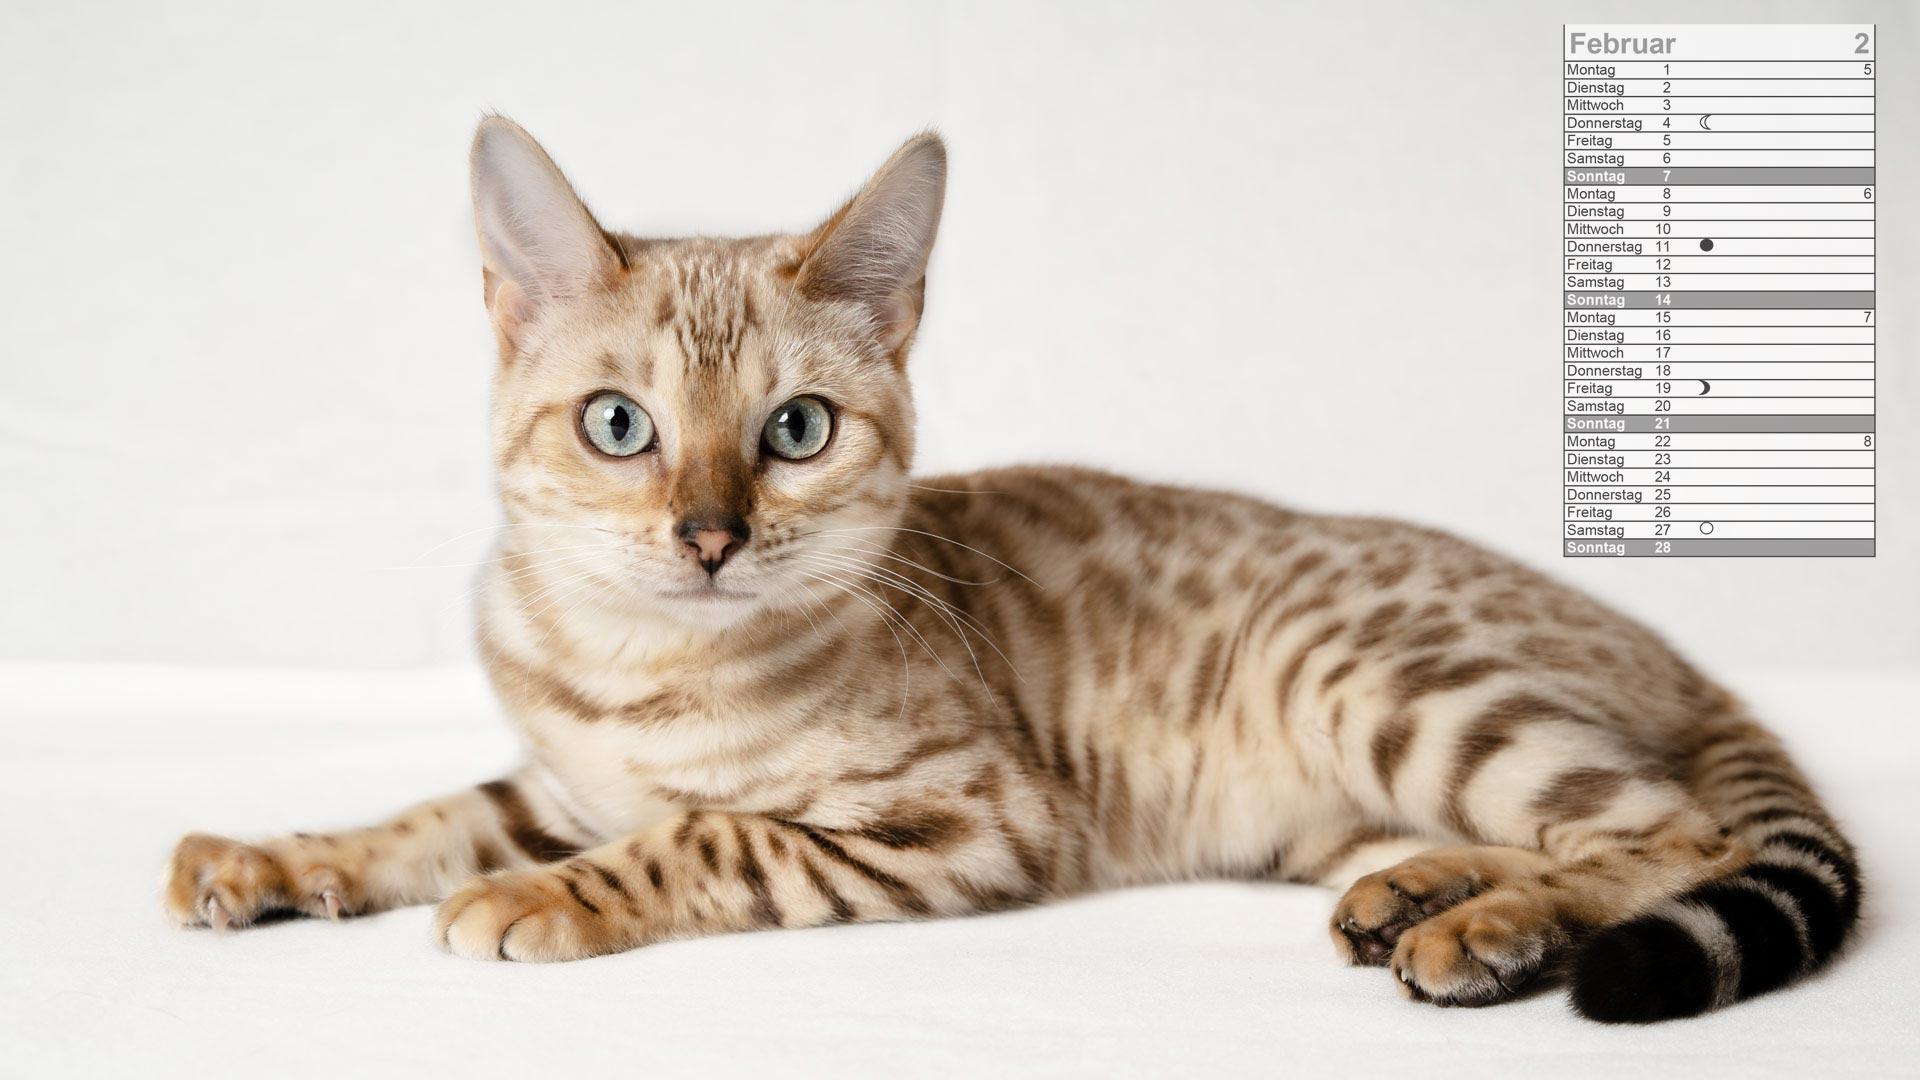 Bengal Katze Mondkalender